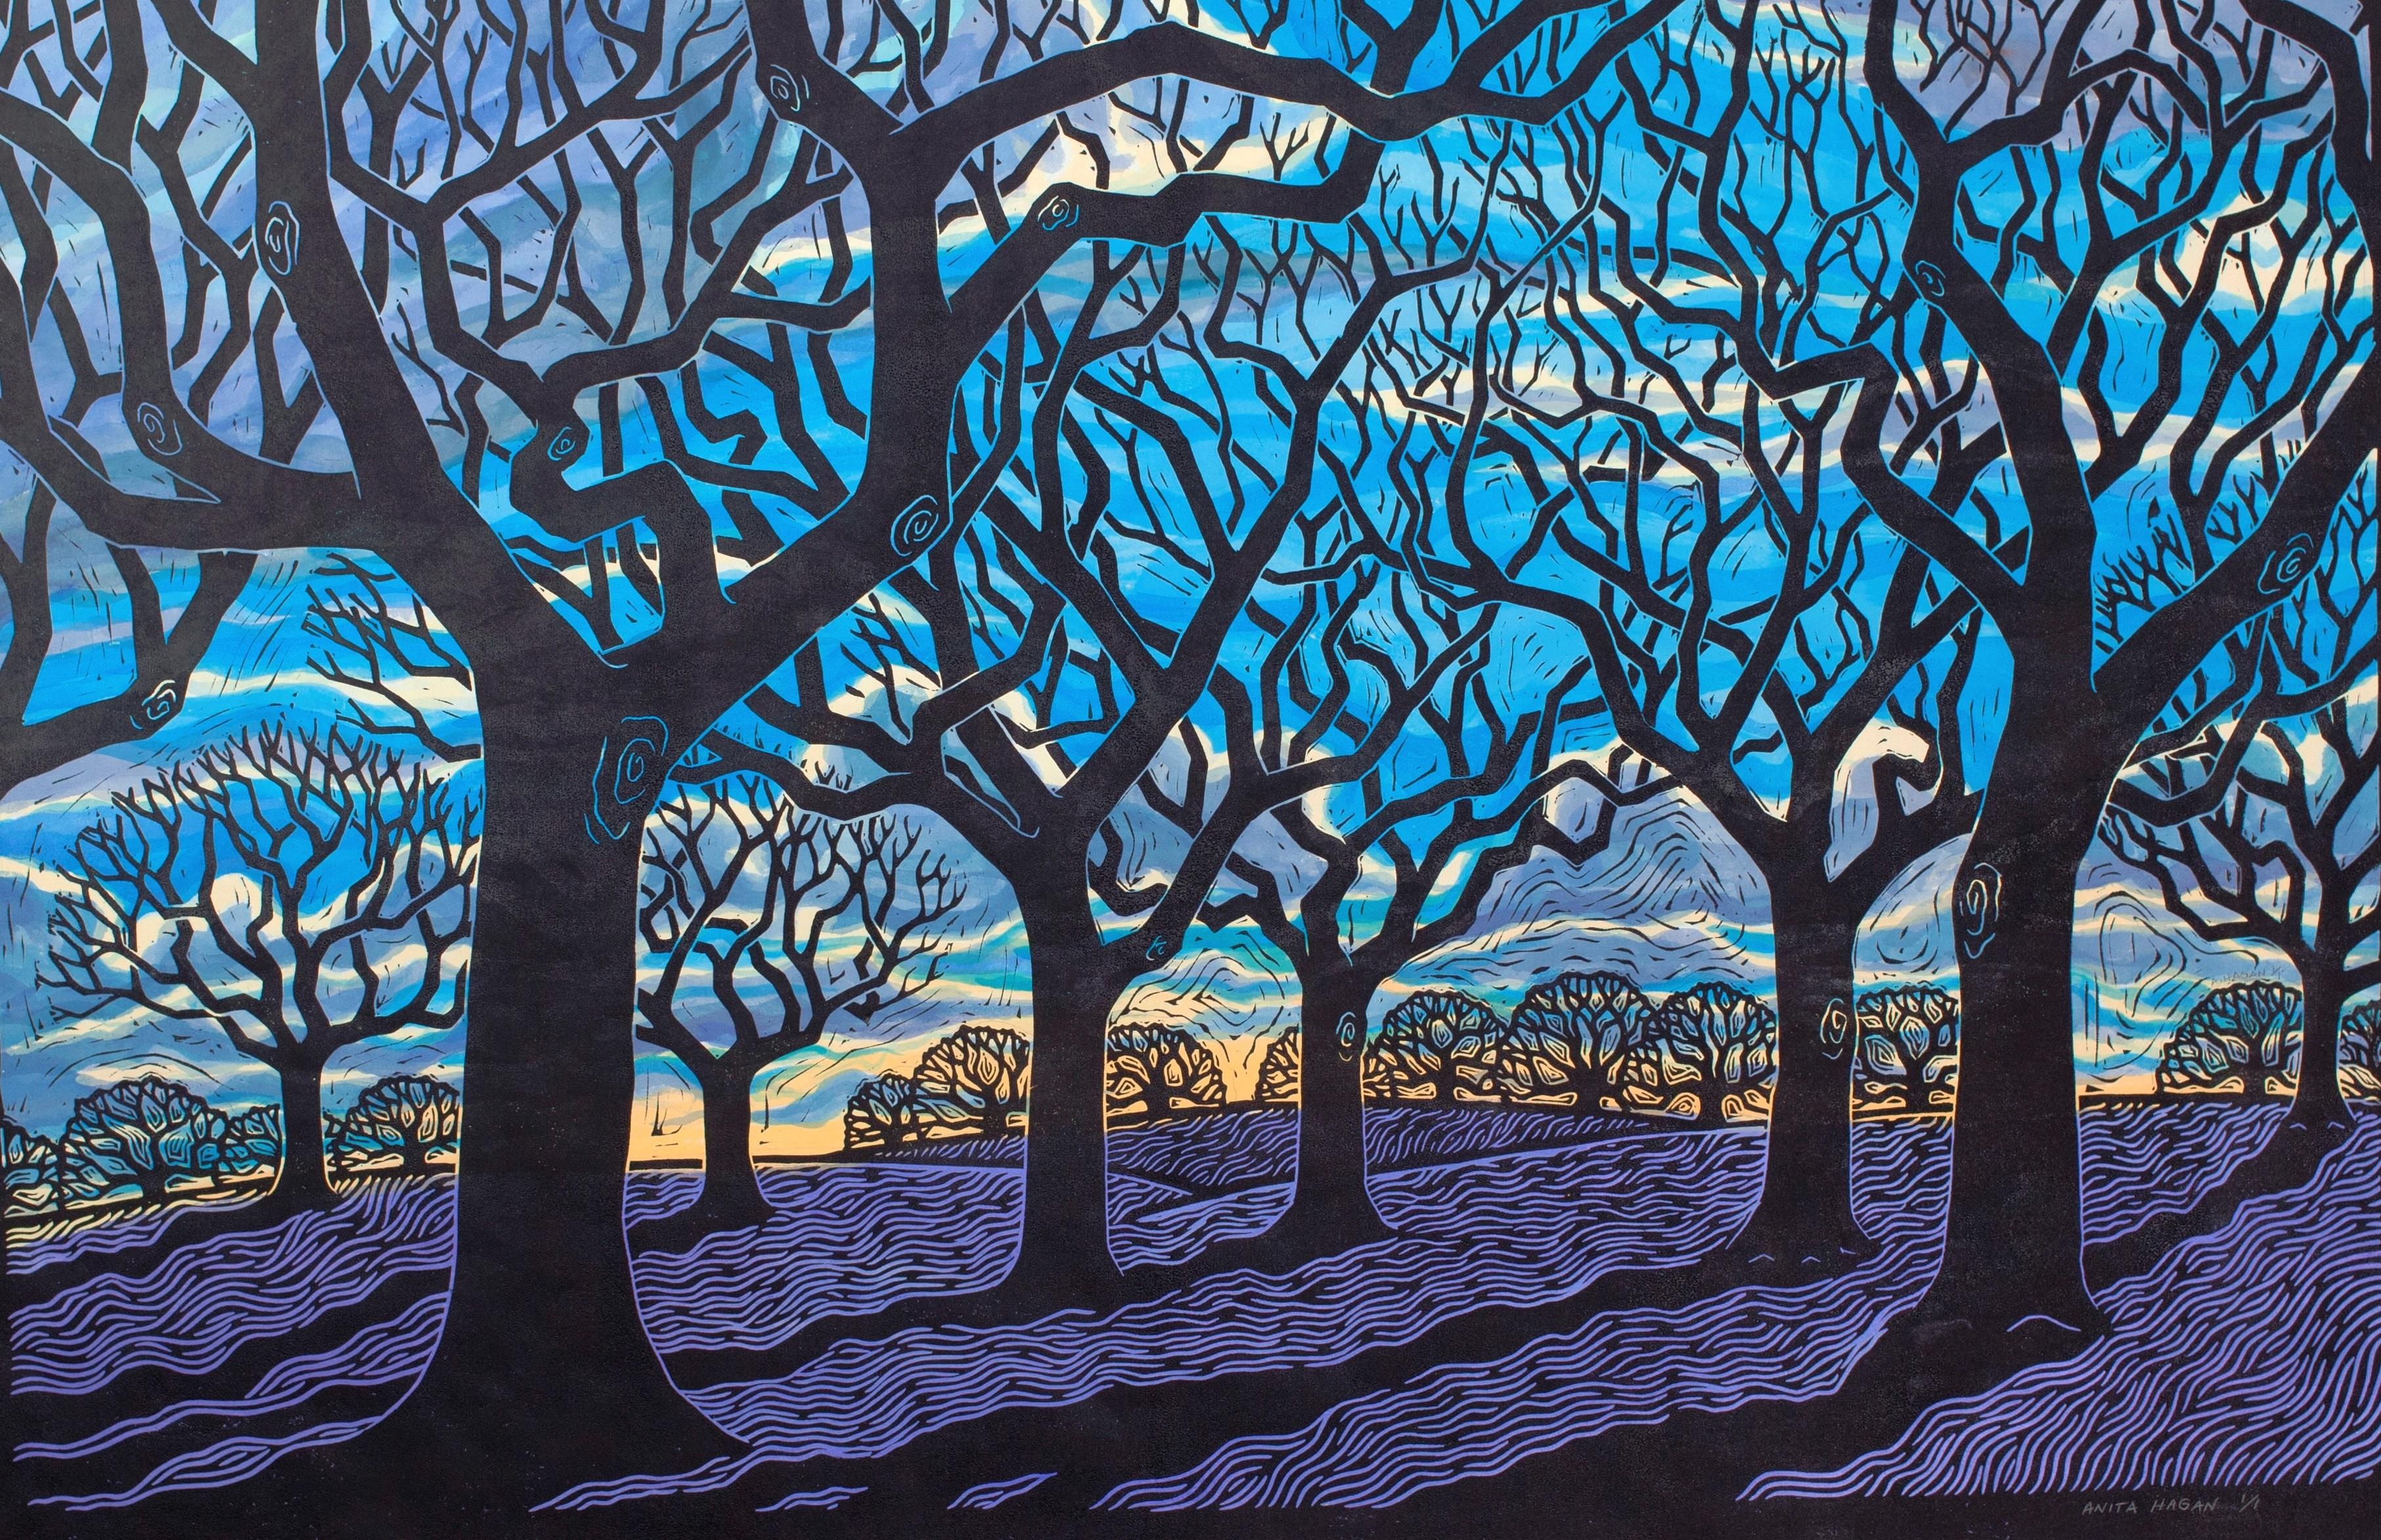 """Sacred Grove""- 24"" x 36""- Linoleum block print with watercolor on handmade Kozo paper."